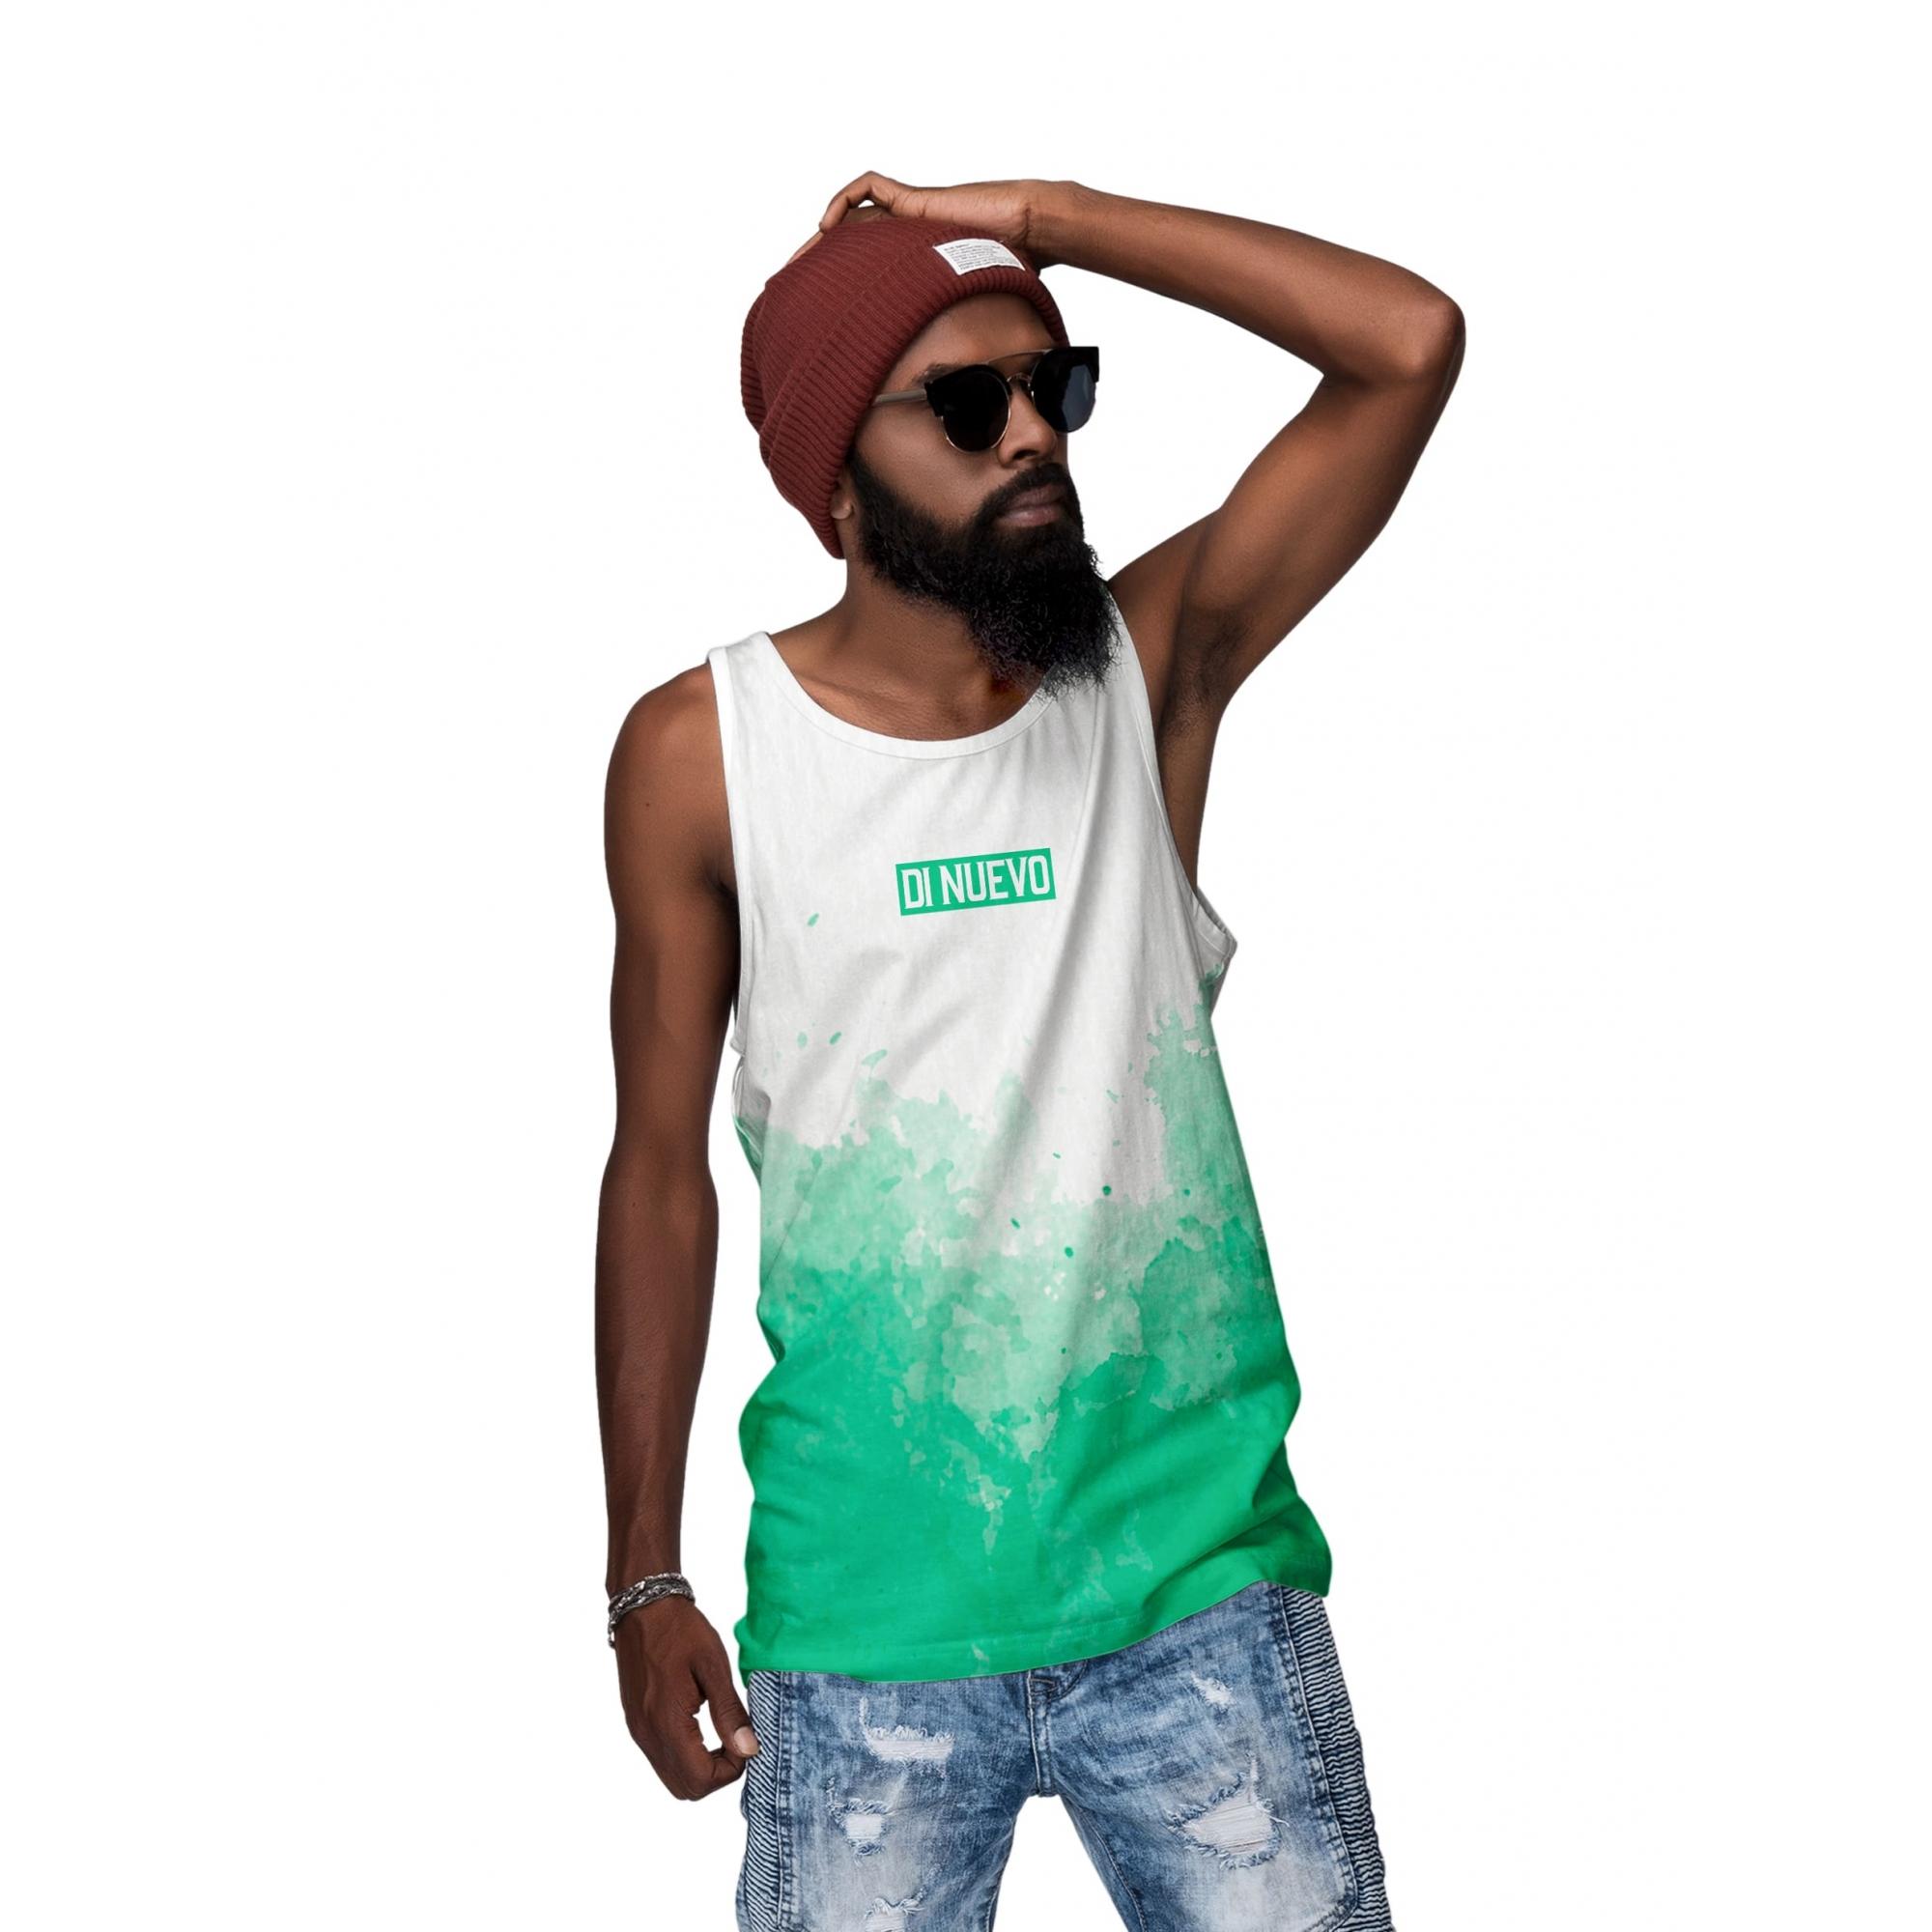 Camiseta Regata Verde Aquarela Masculina Di Nuevo